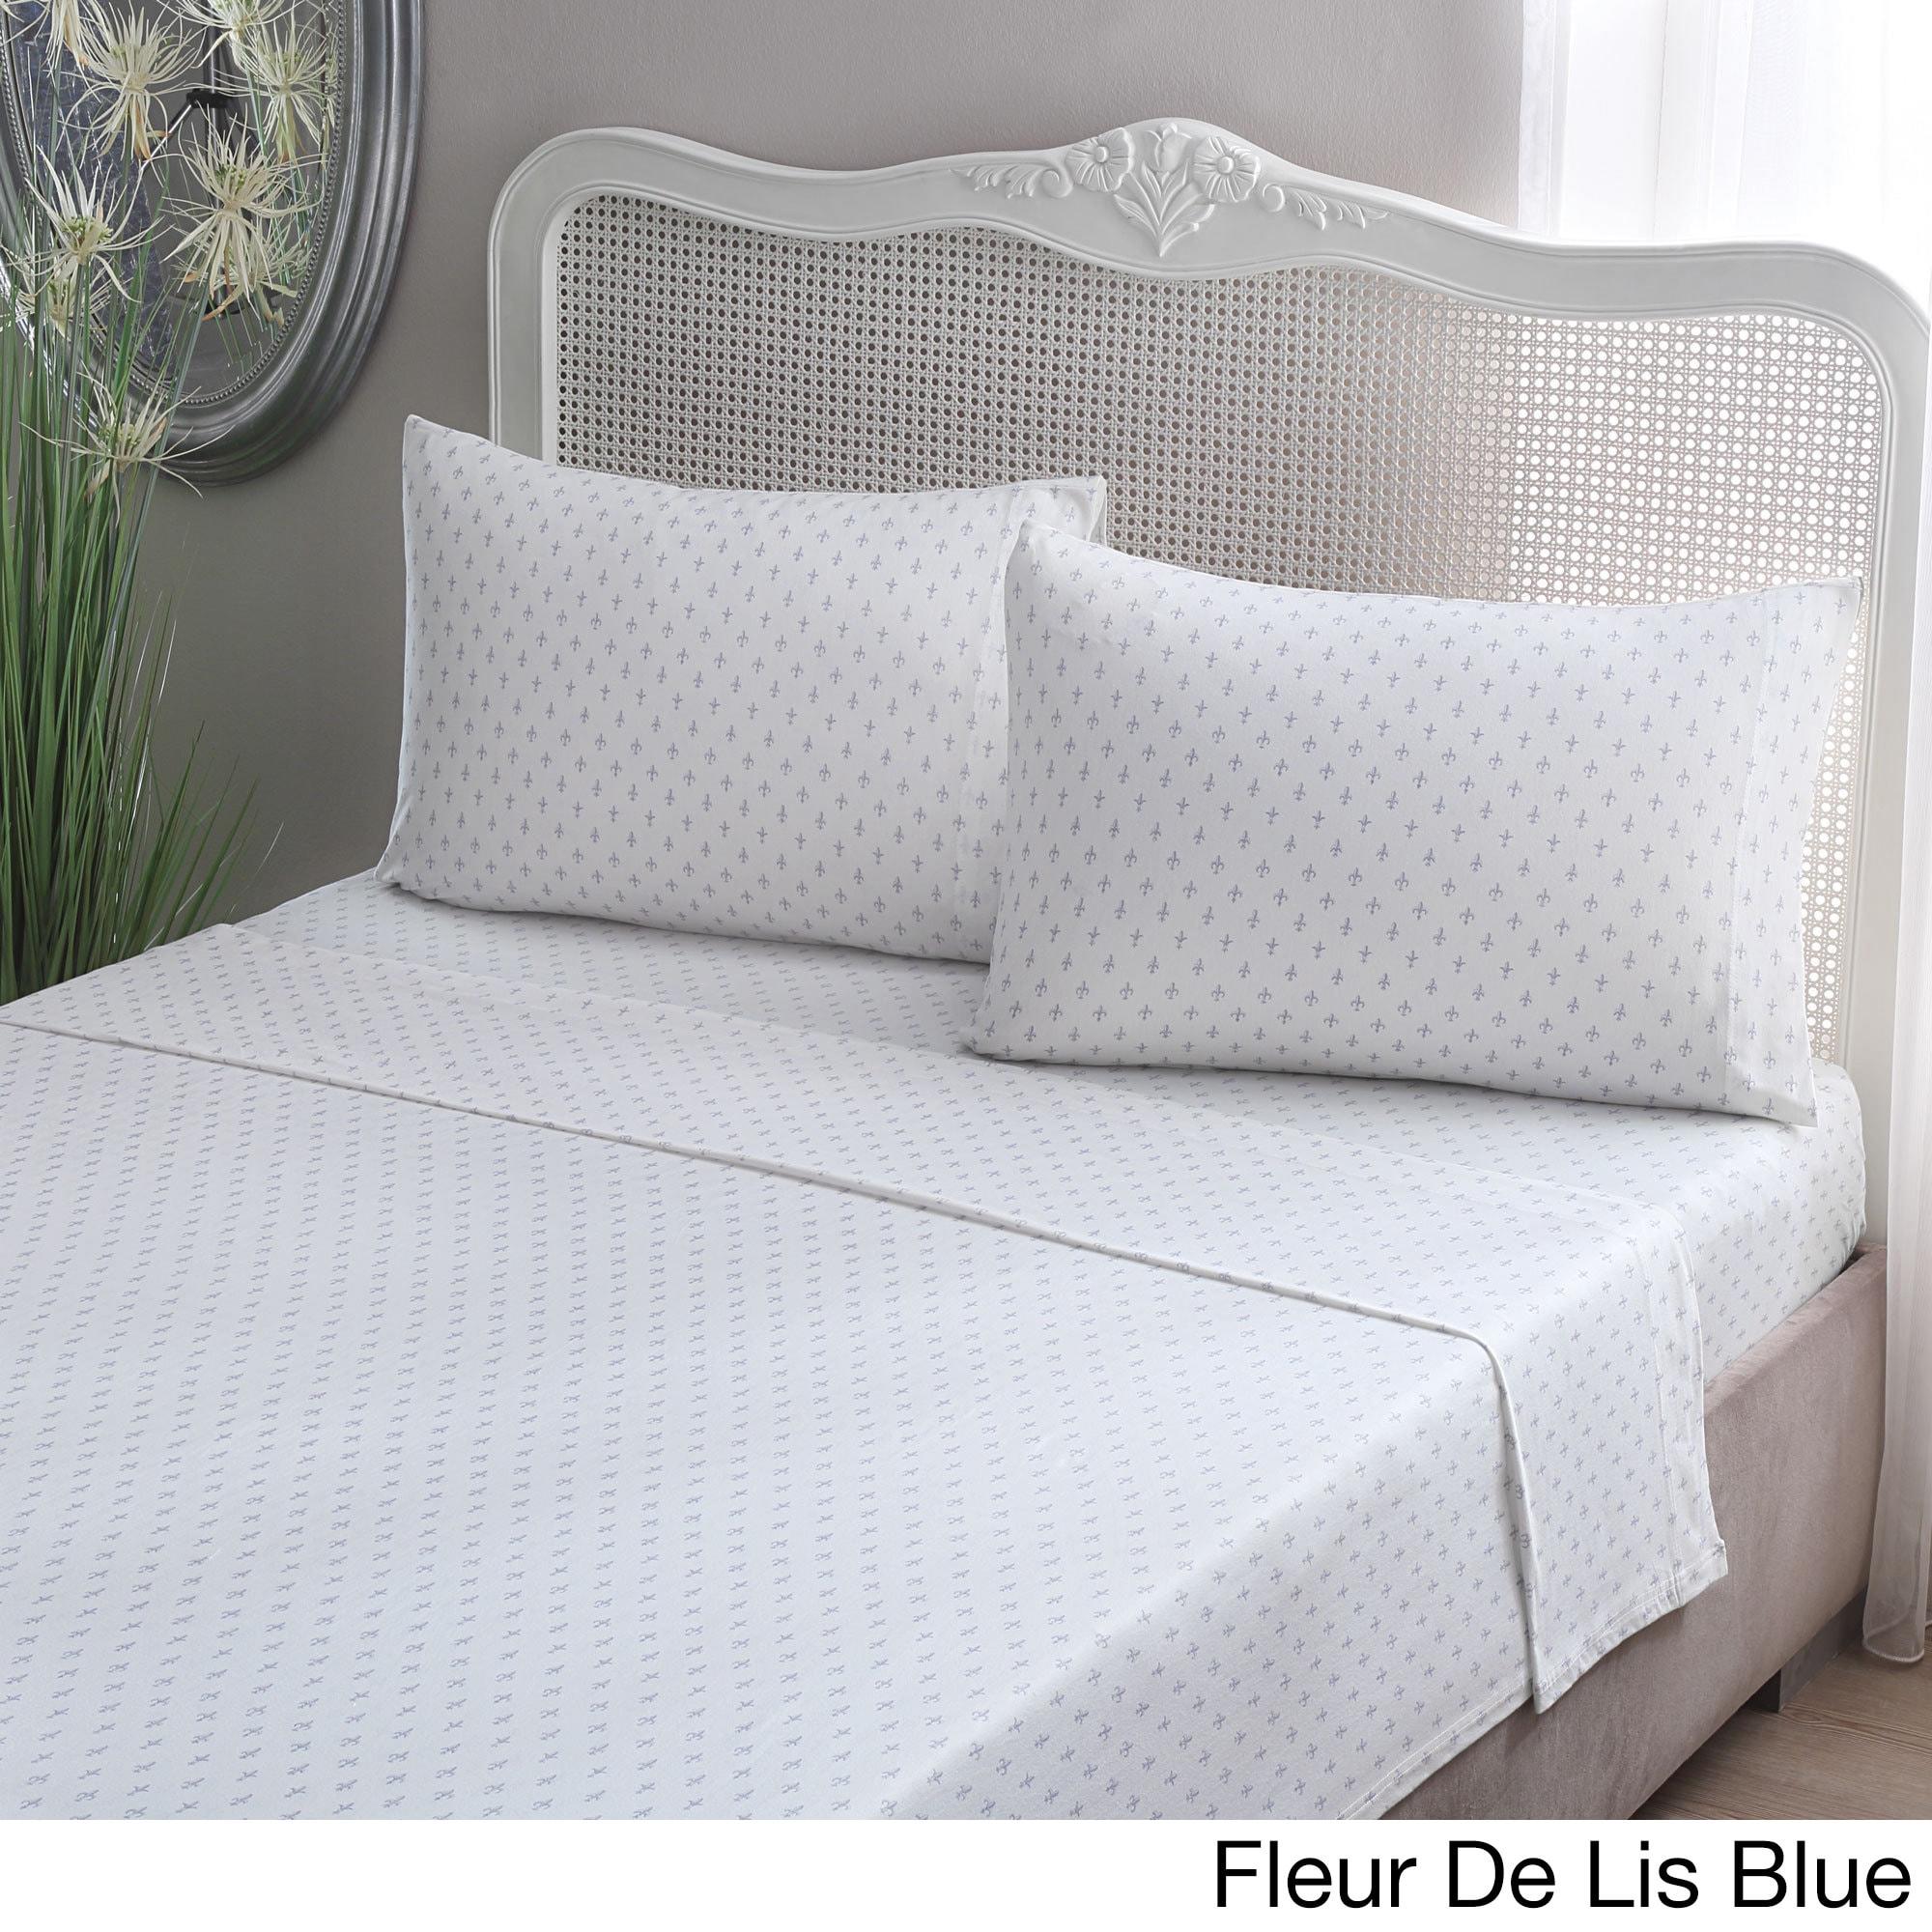 brielle fashion cotton jersey sheet set ebay. Black Bedroom Furniture Sets. Home Design Ideas